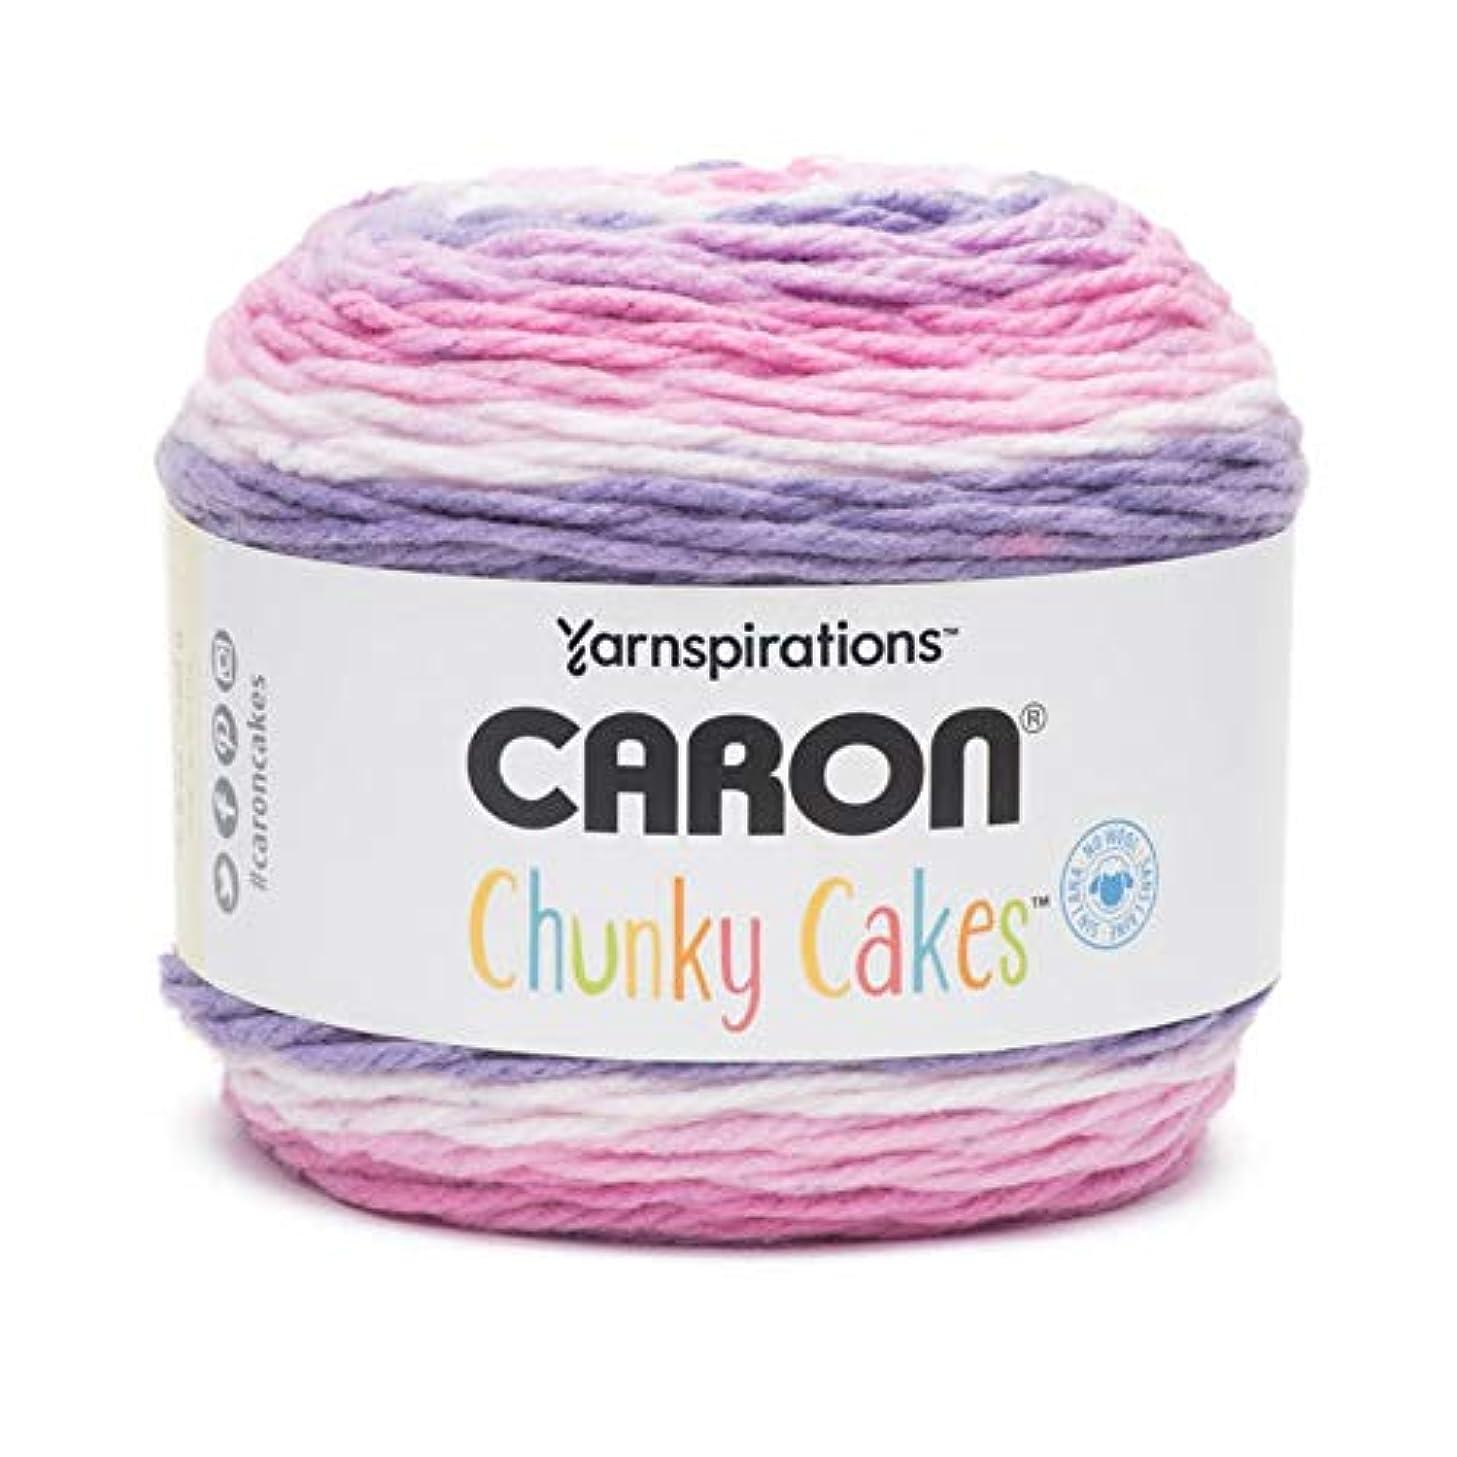 Caron Chunky Cakes Self Striping Yarn 297 yd/271 m 9.8 oz/280 g (Ballet Sorbet)